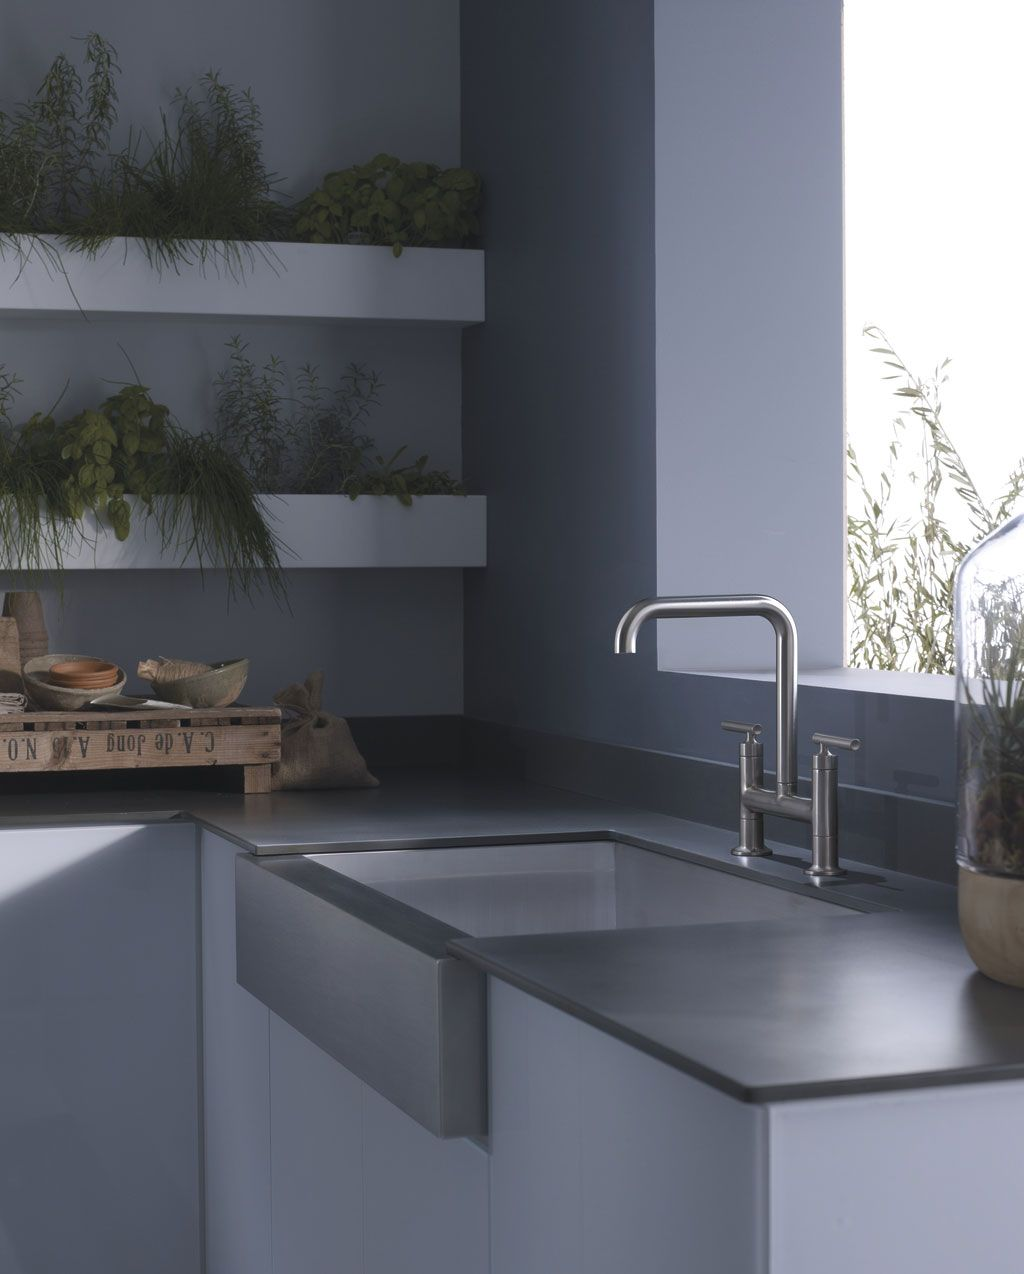 Kohler Purist Kitchen Faucet 1 Hole Kitchen Sink Mixer